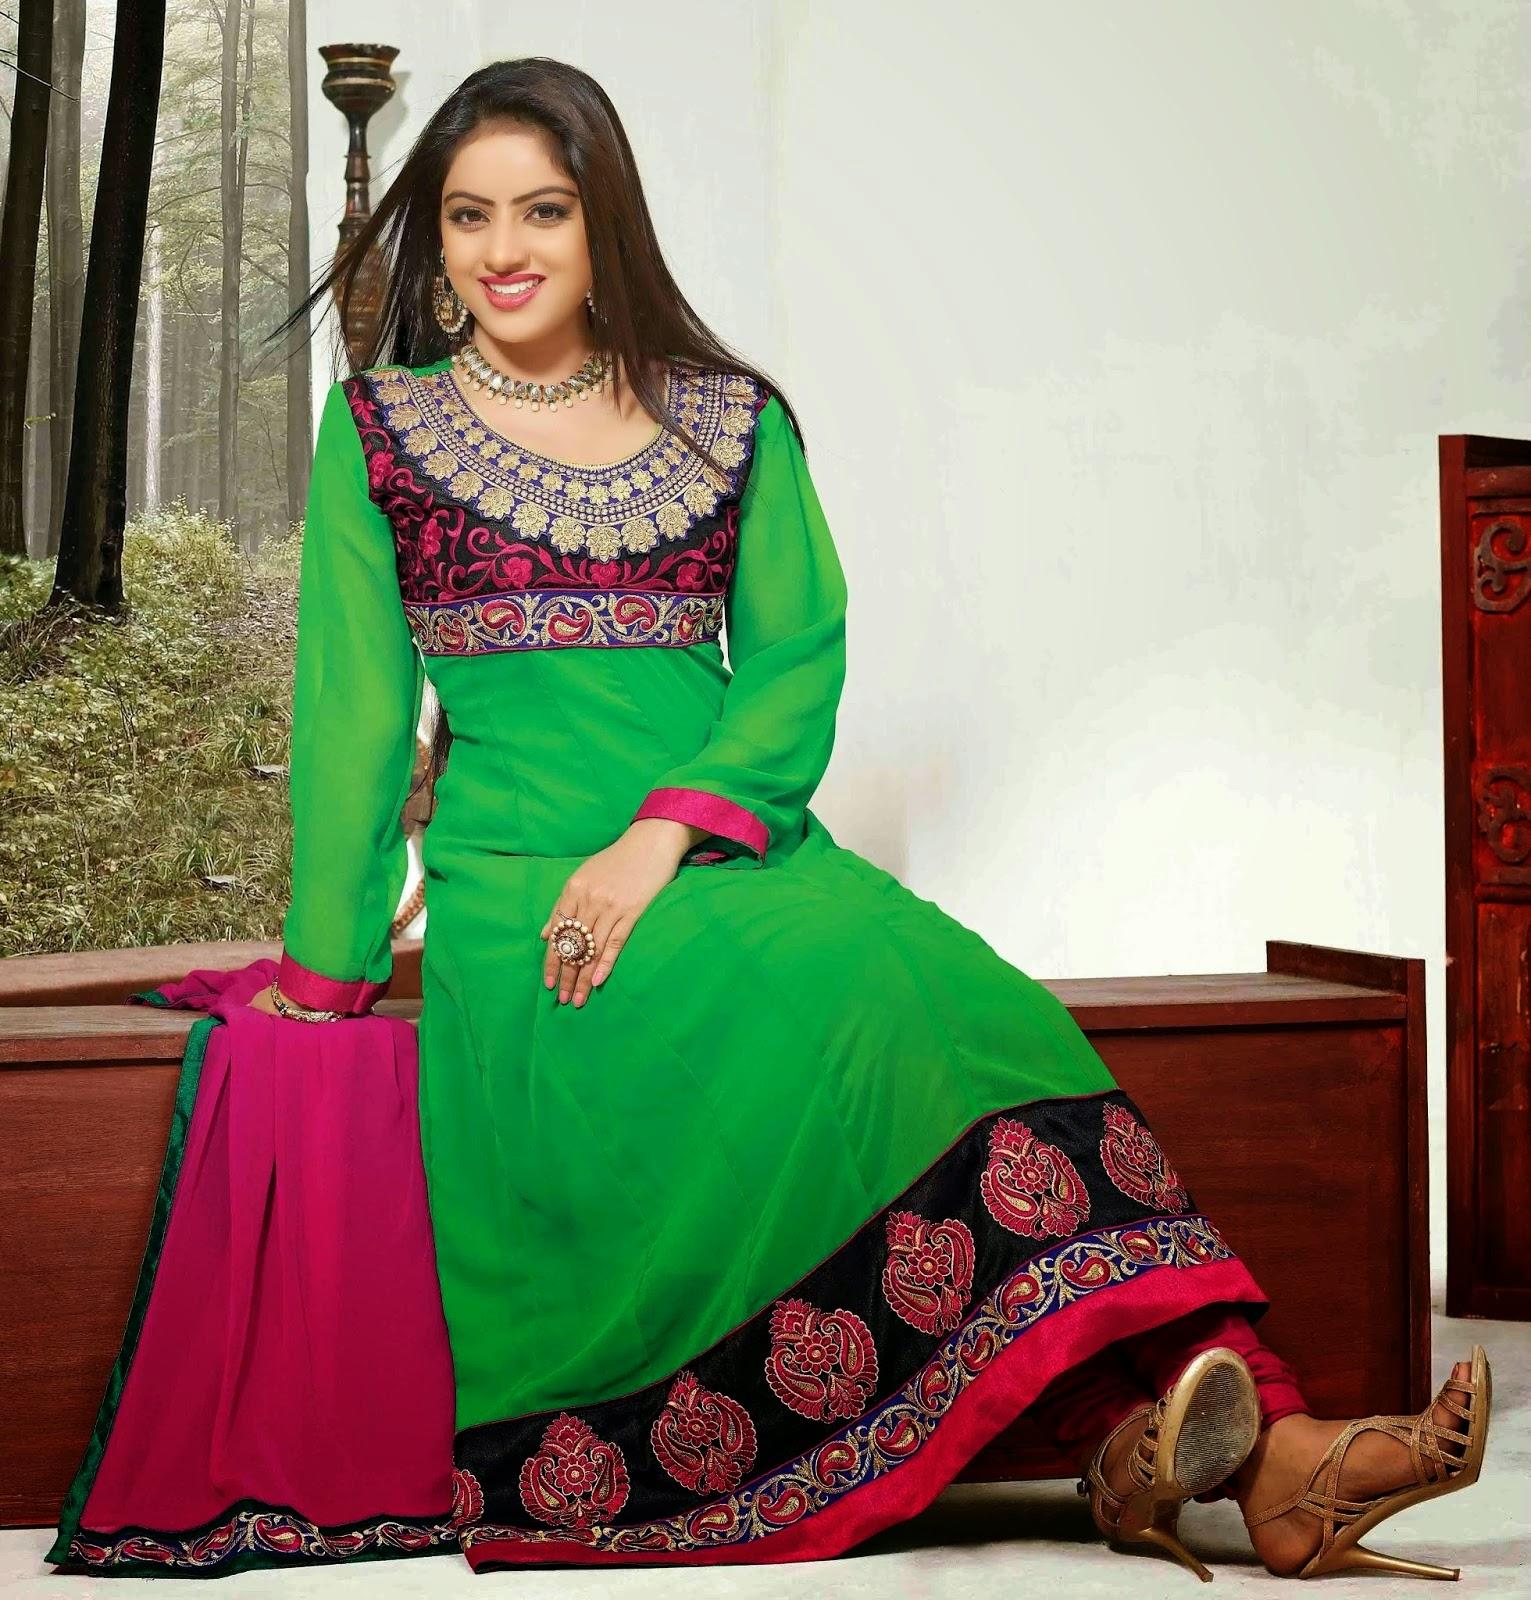 Deepika Singh HD Wallpapers Free Download -I-